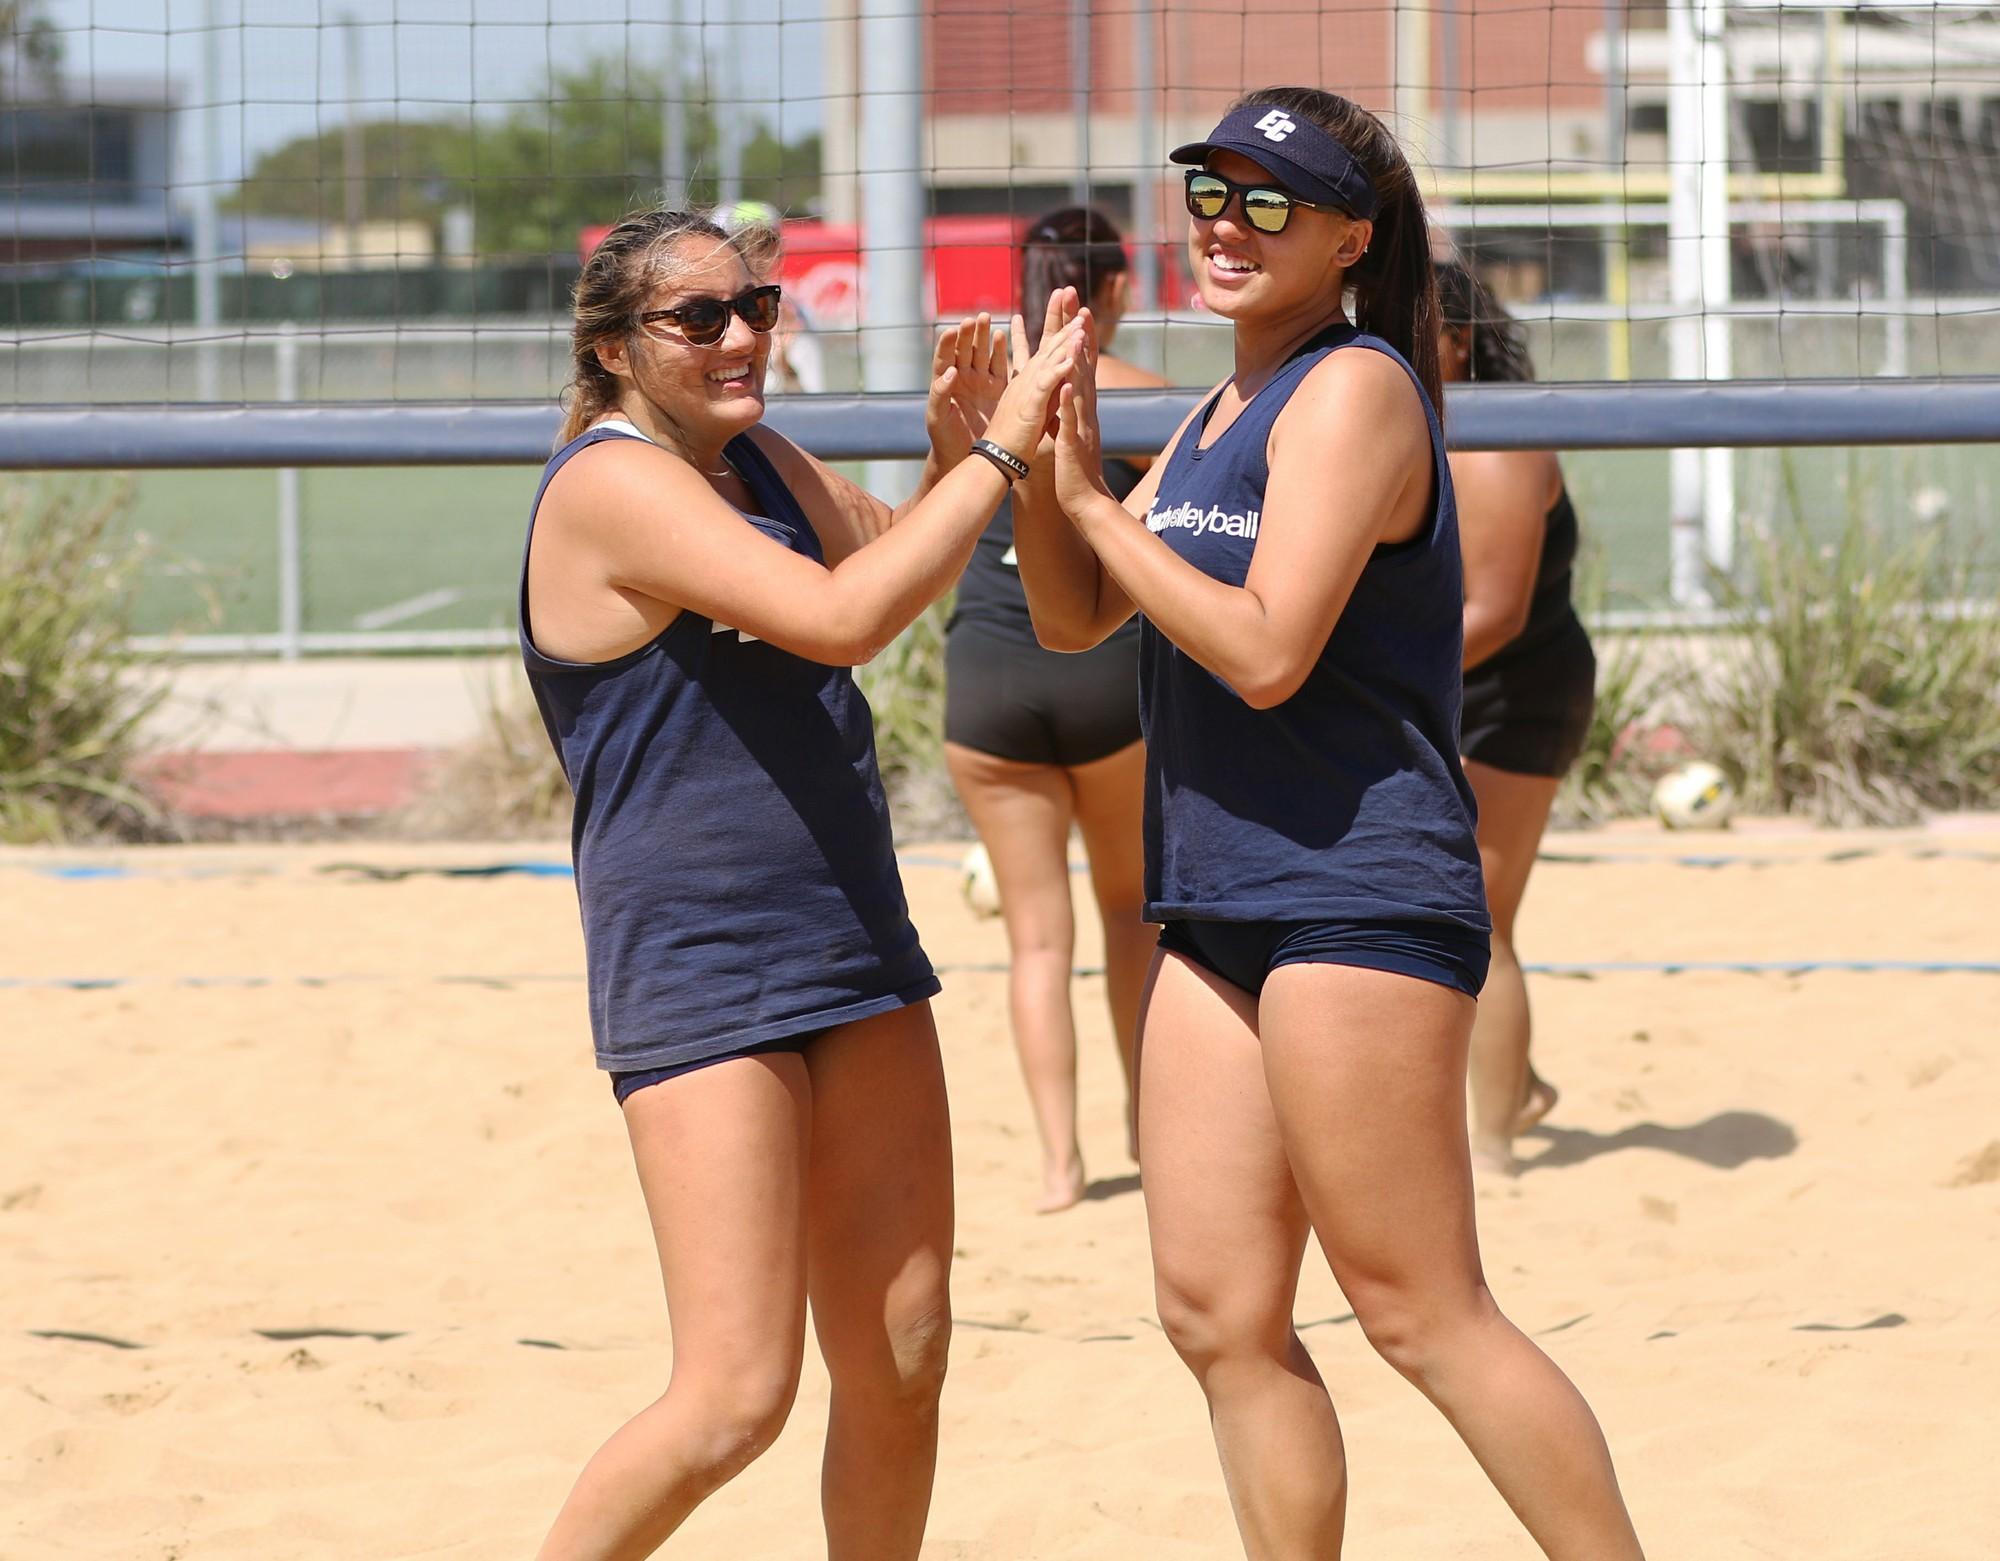 girls-playing-volleyball-no-clothes-idlebraincom-xxx